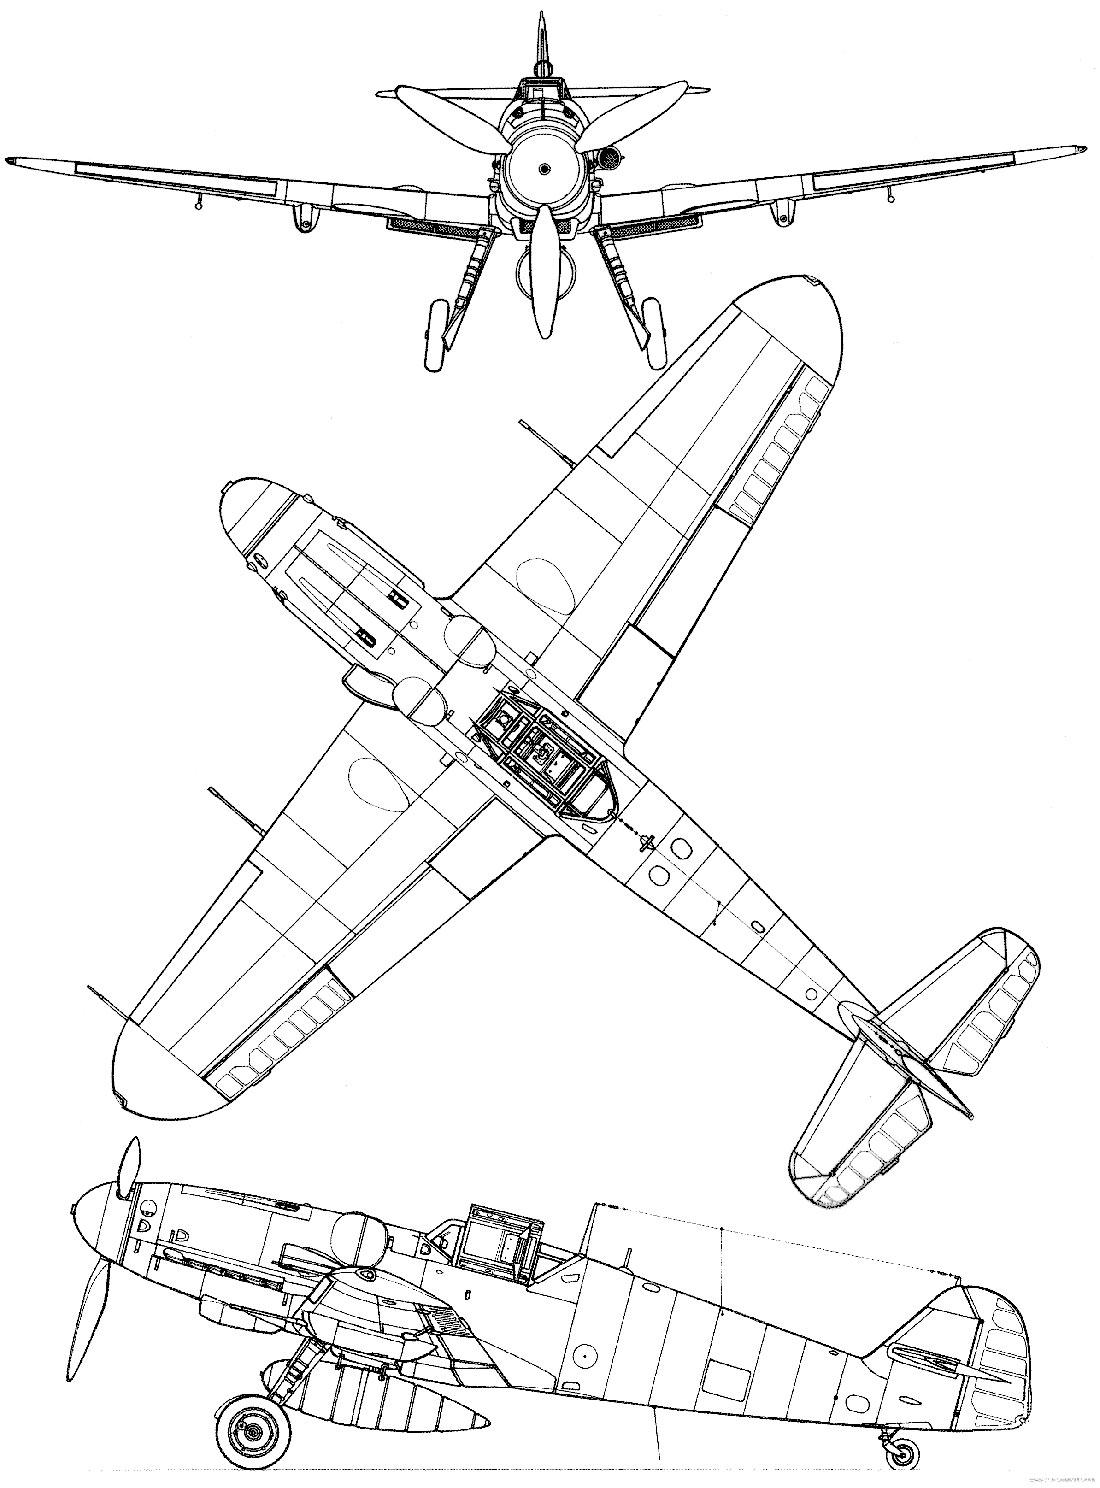 Чертеж истребителя Мессершмитт Bf-109